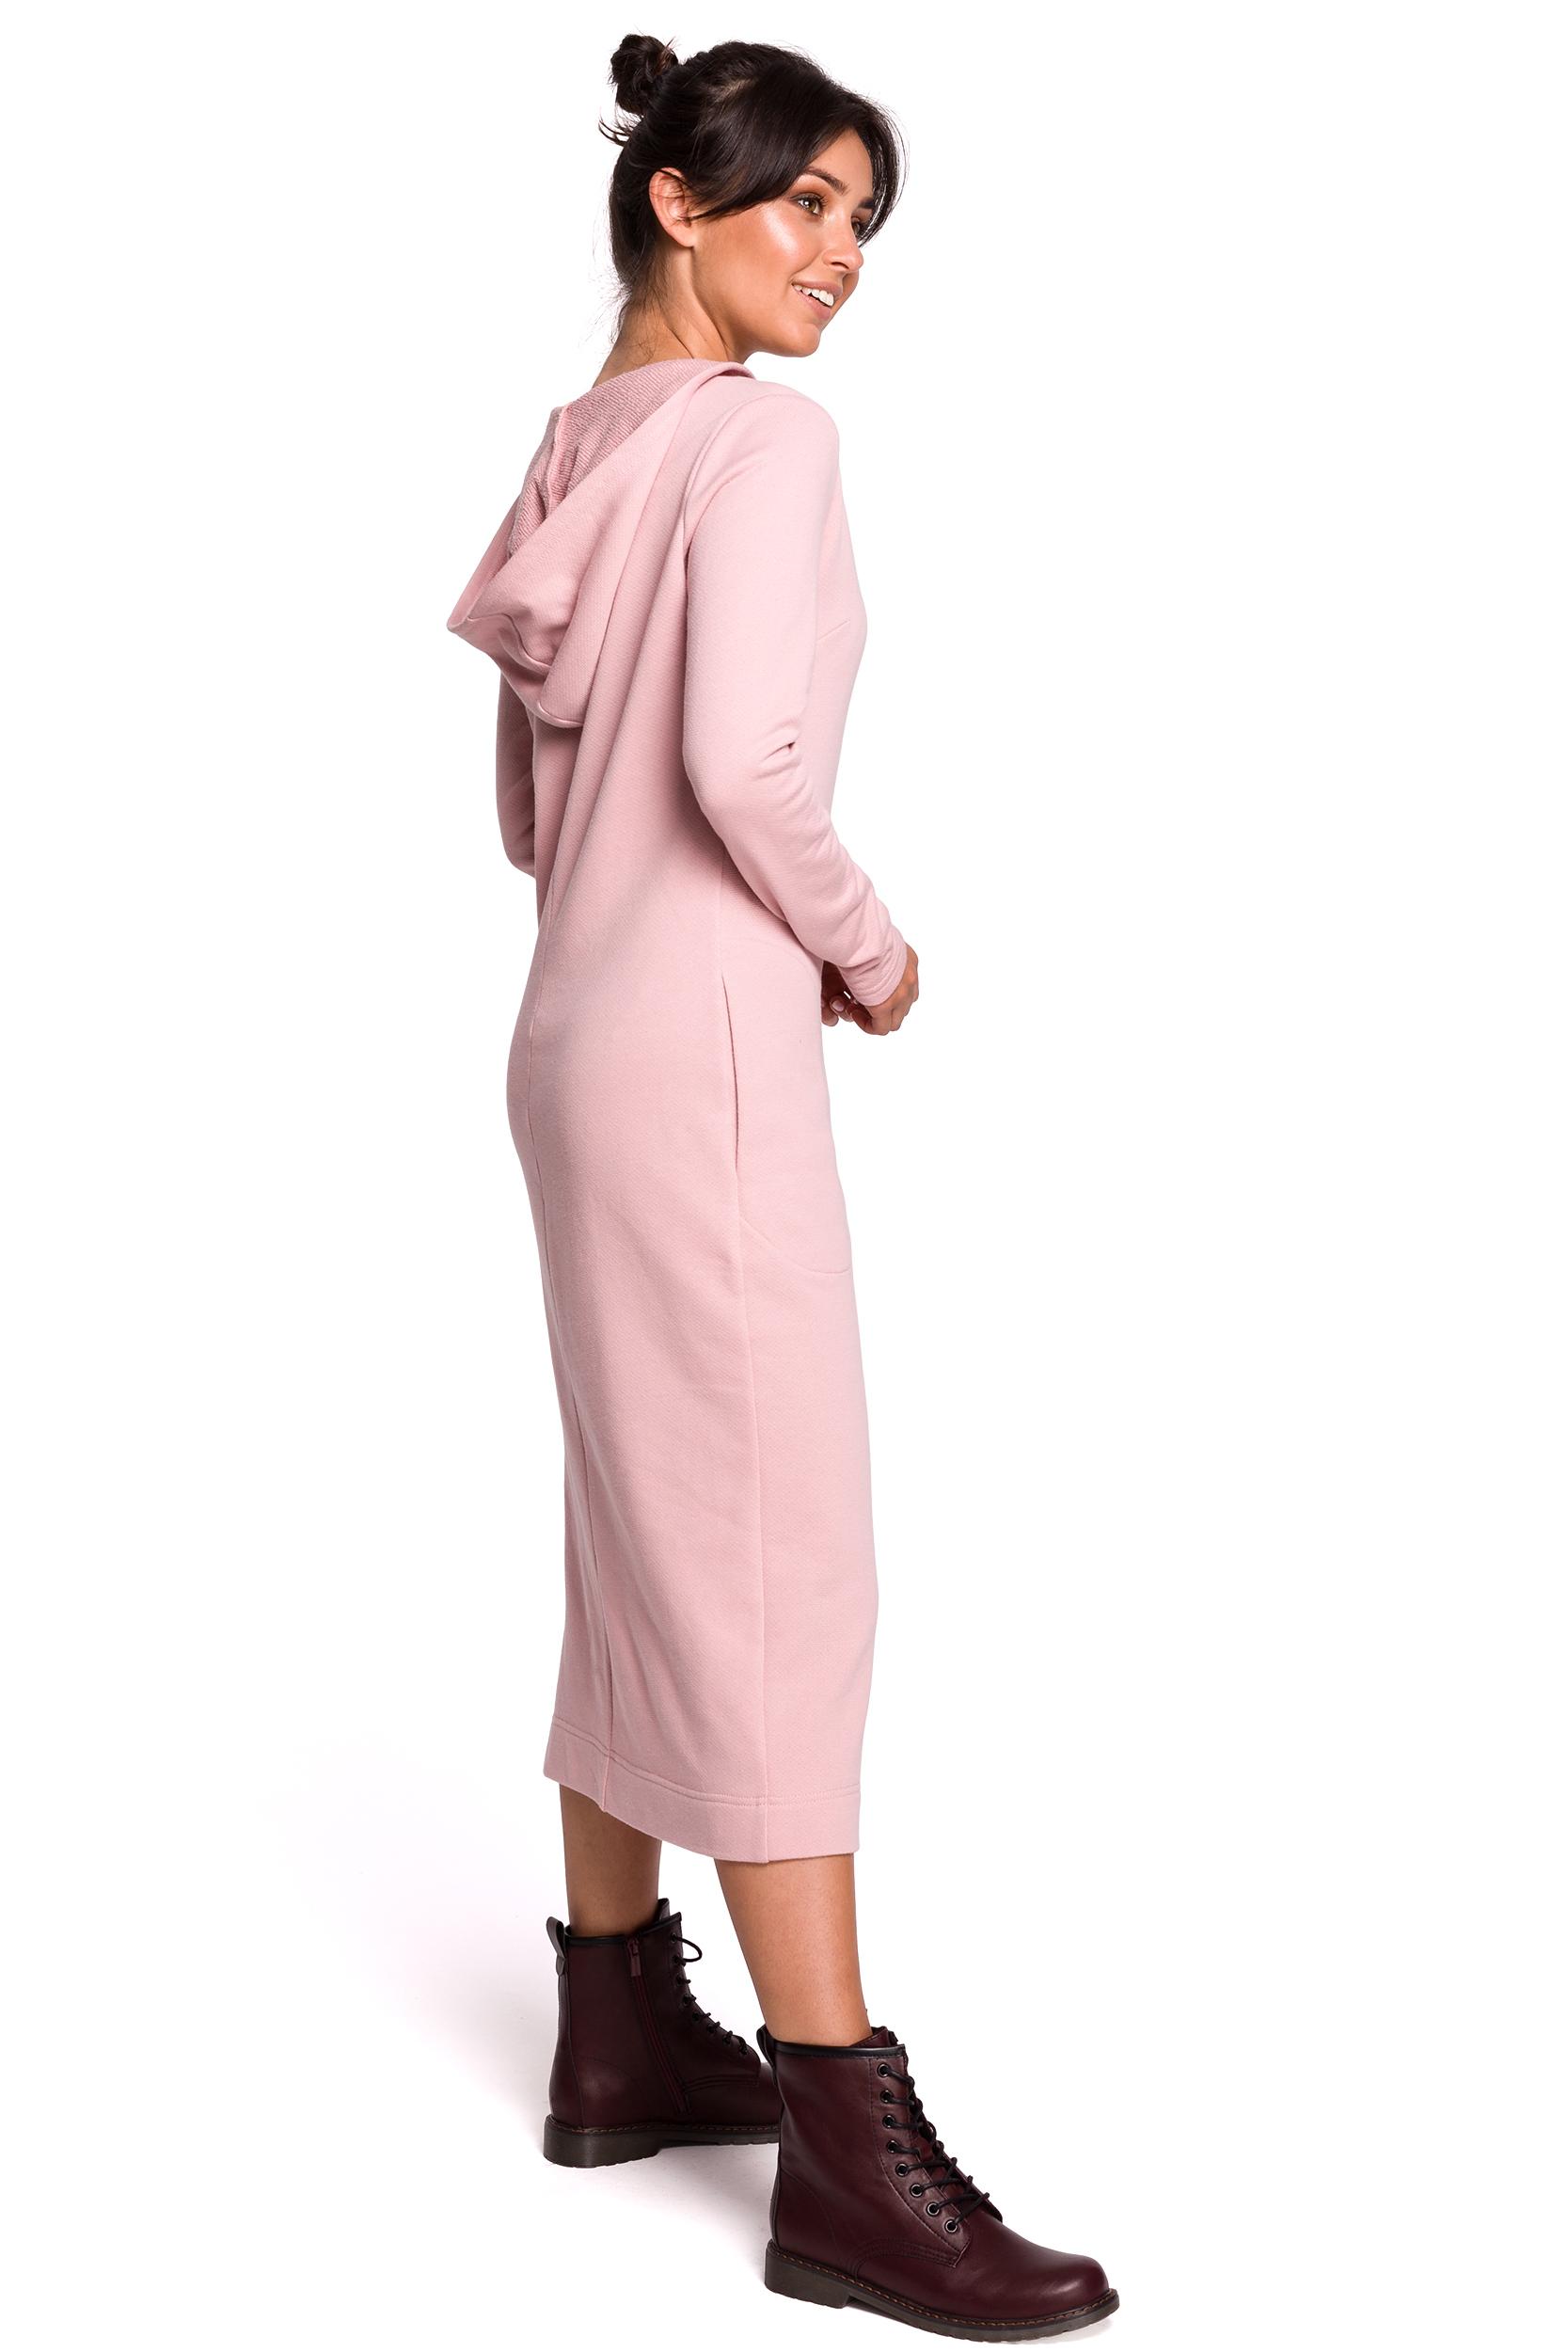 BE hupparimekko B128 vaaleanpunainen Leeloo